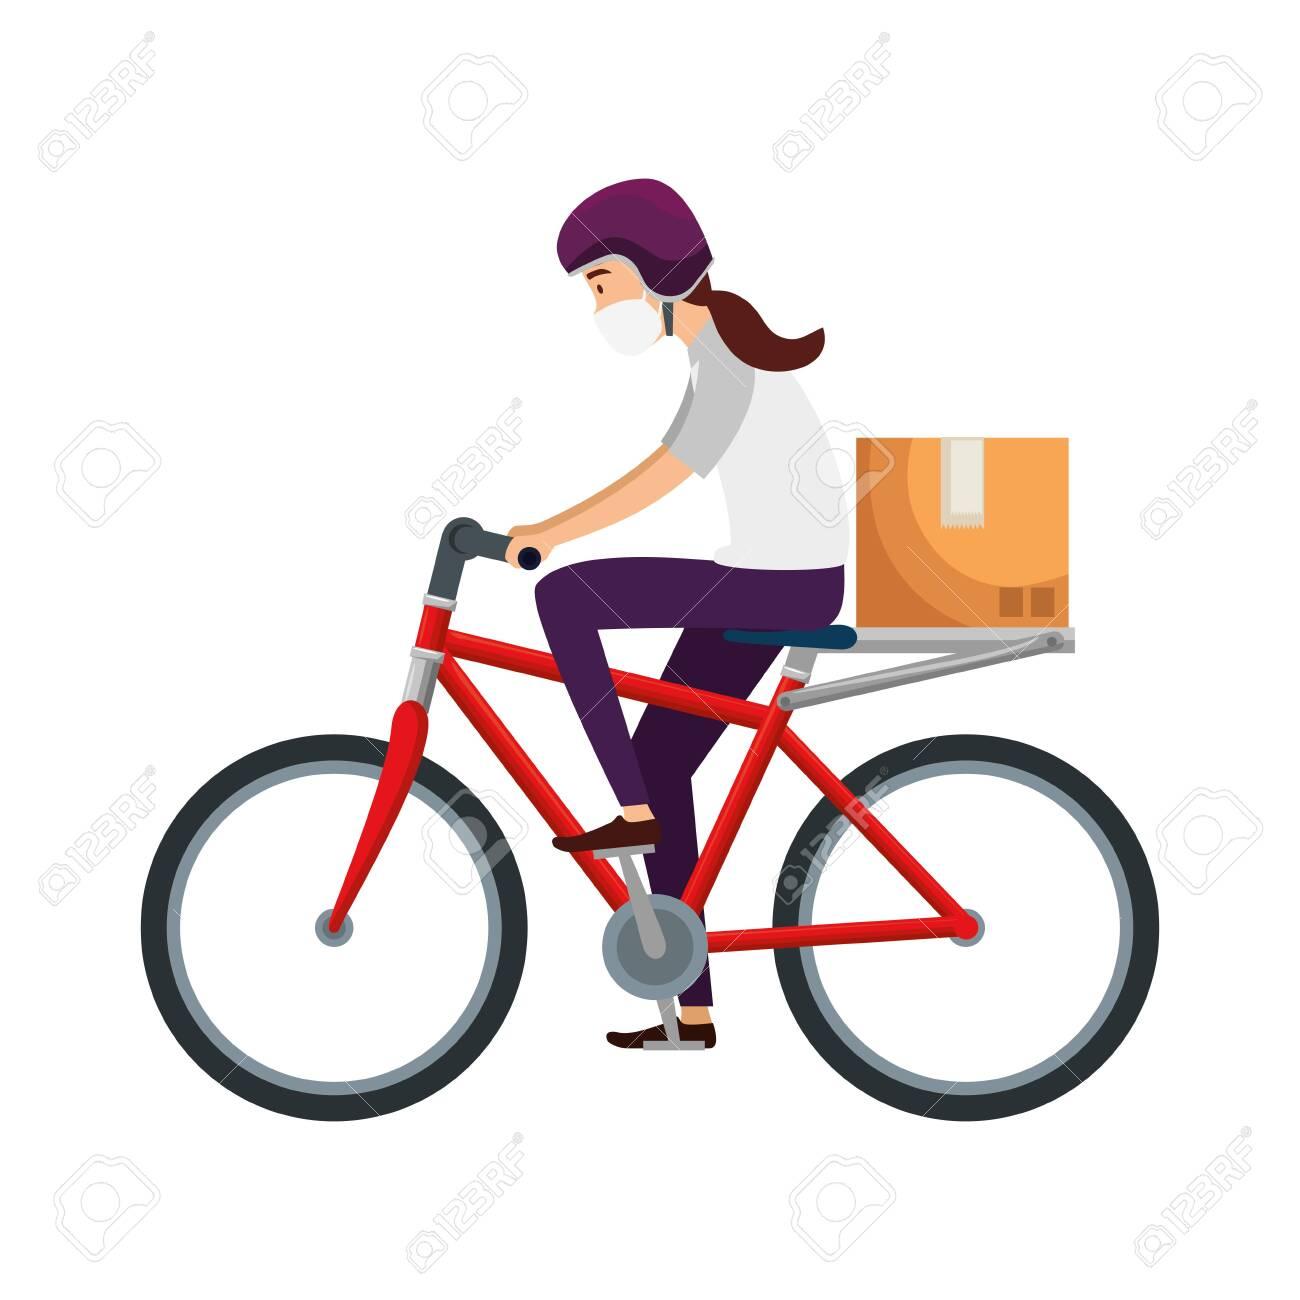 delivery worker female using face mask in bike vector illustration design - 144917335